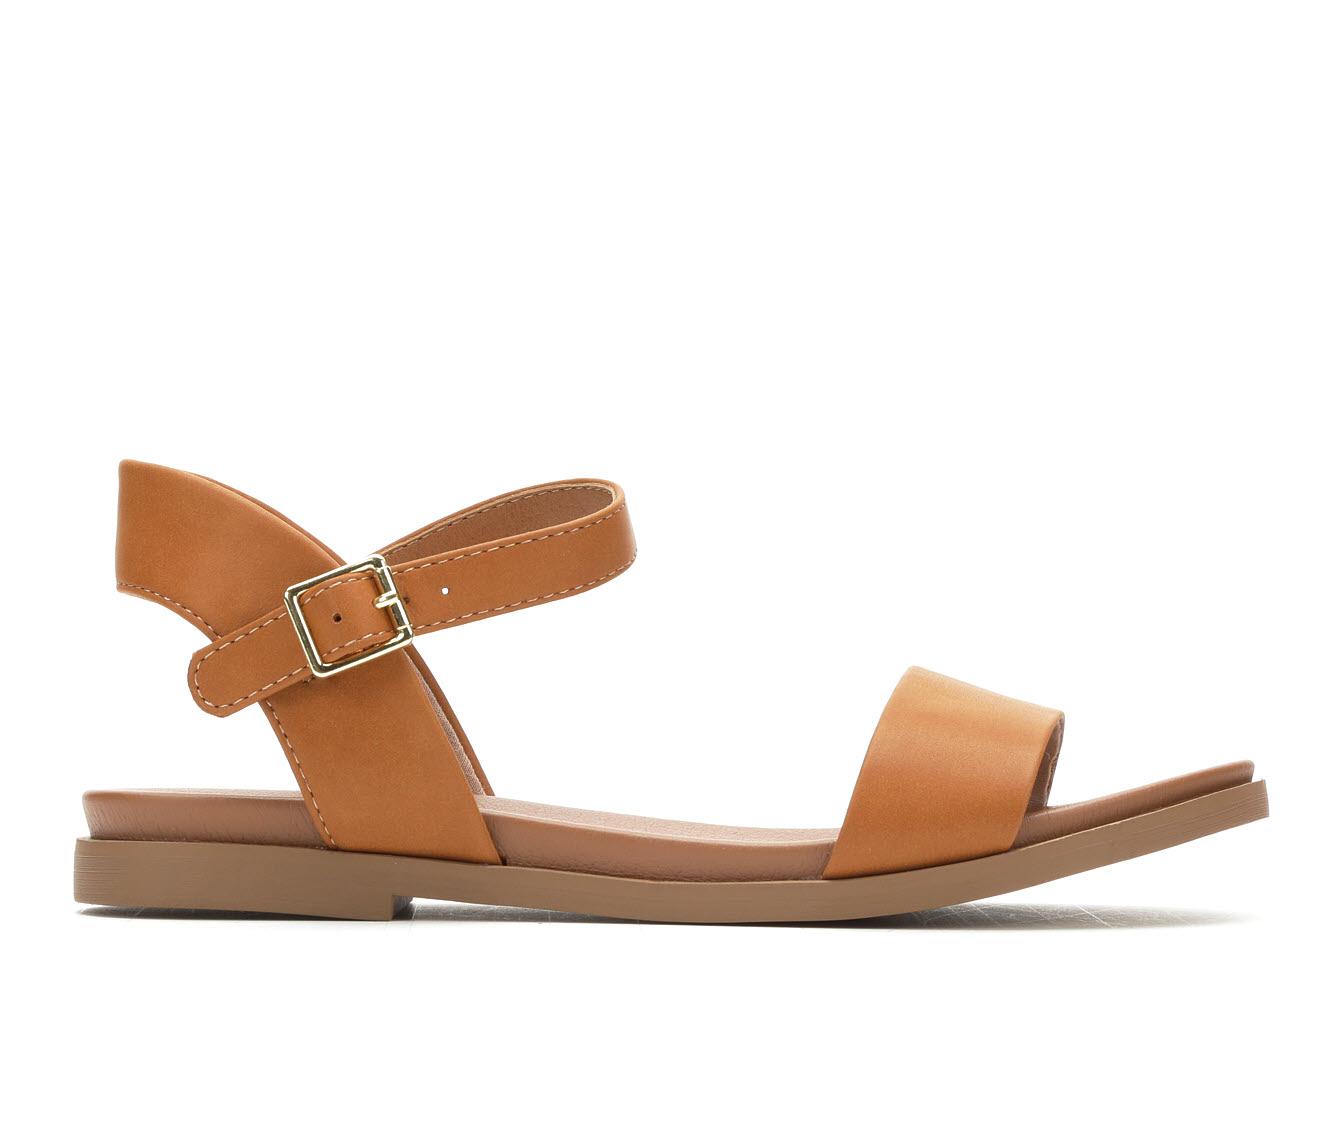 Solanz Meadow Women's Sandal (Brown Faux Leather)